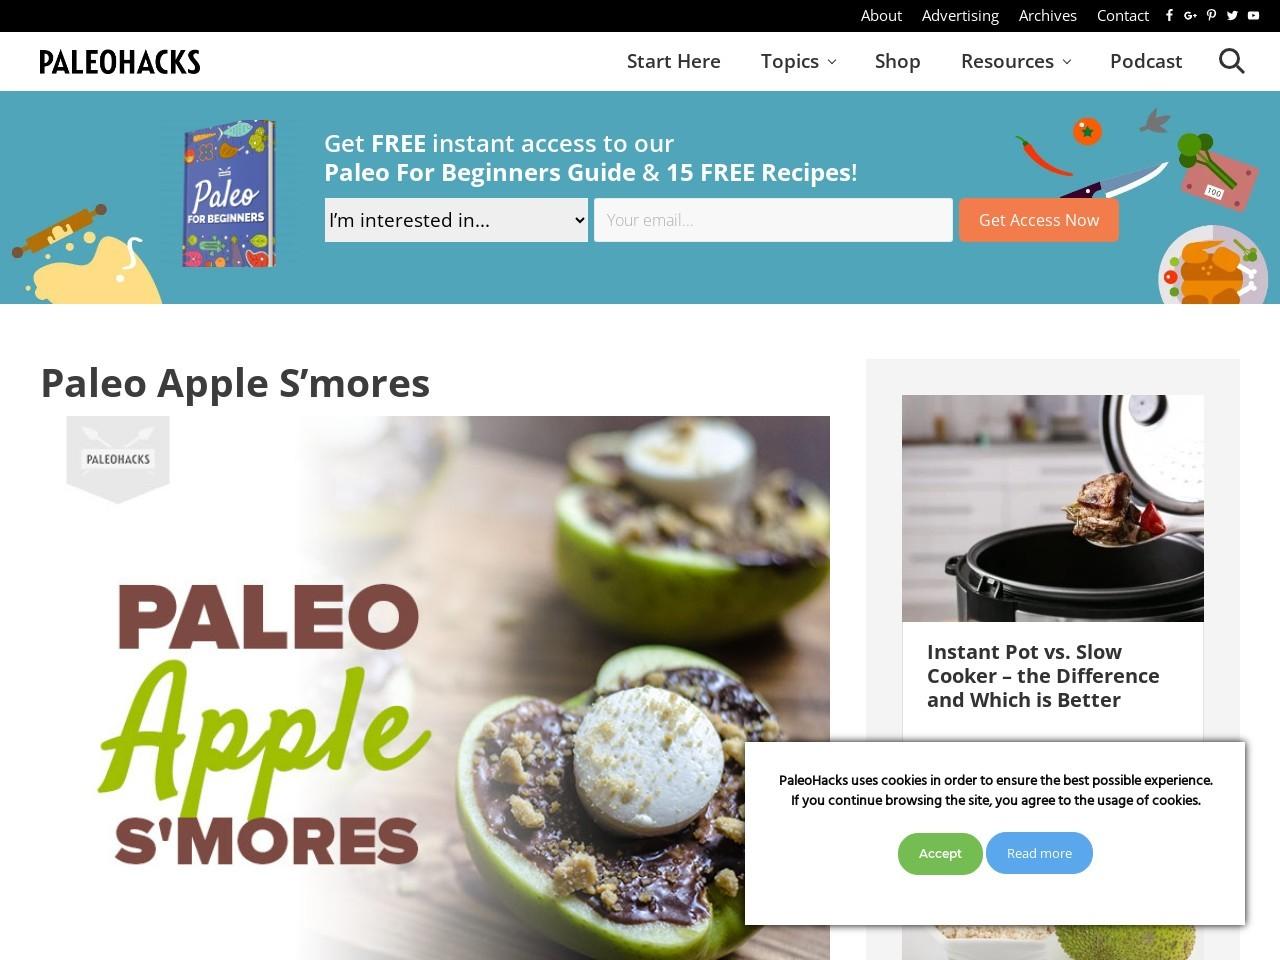 Paleo Apple S'mores